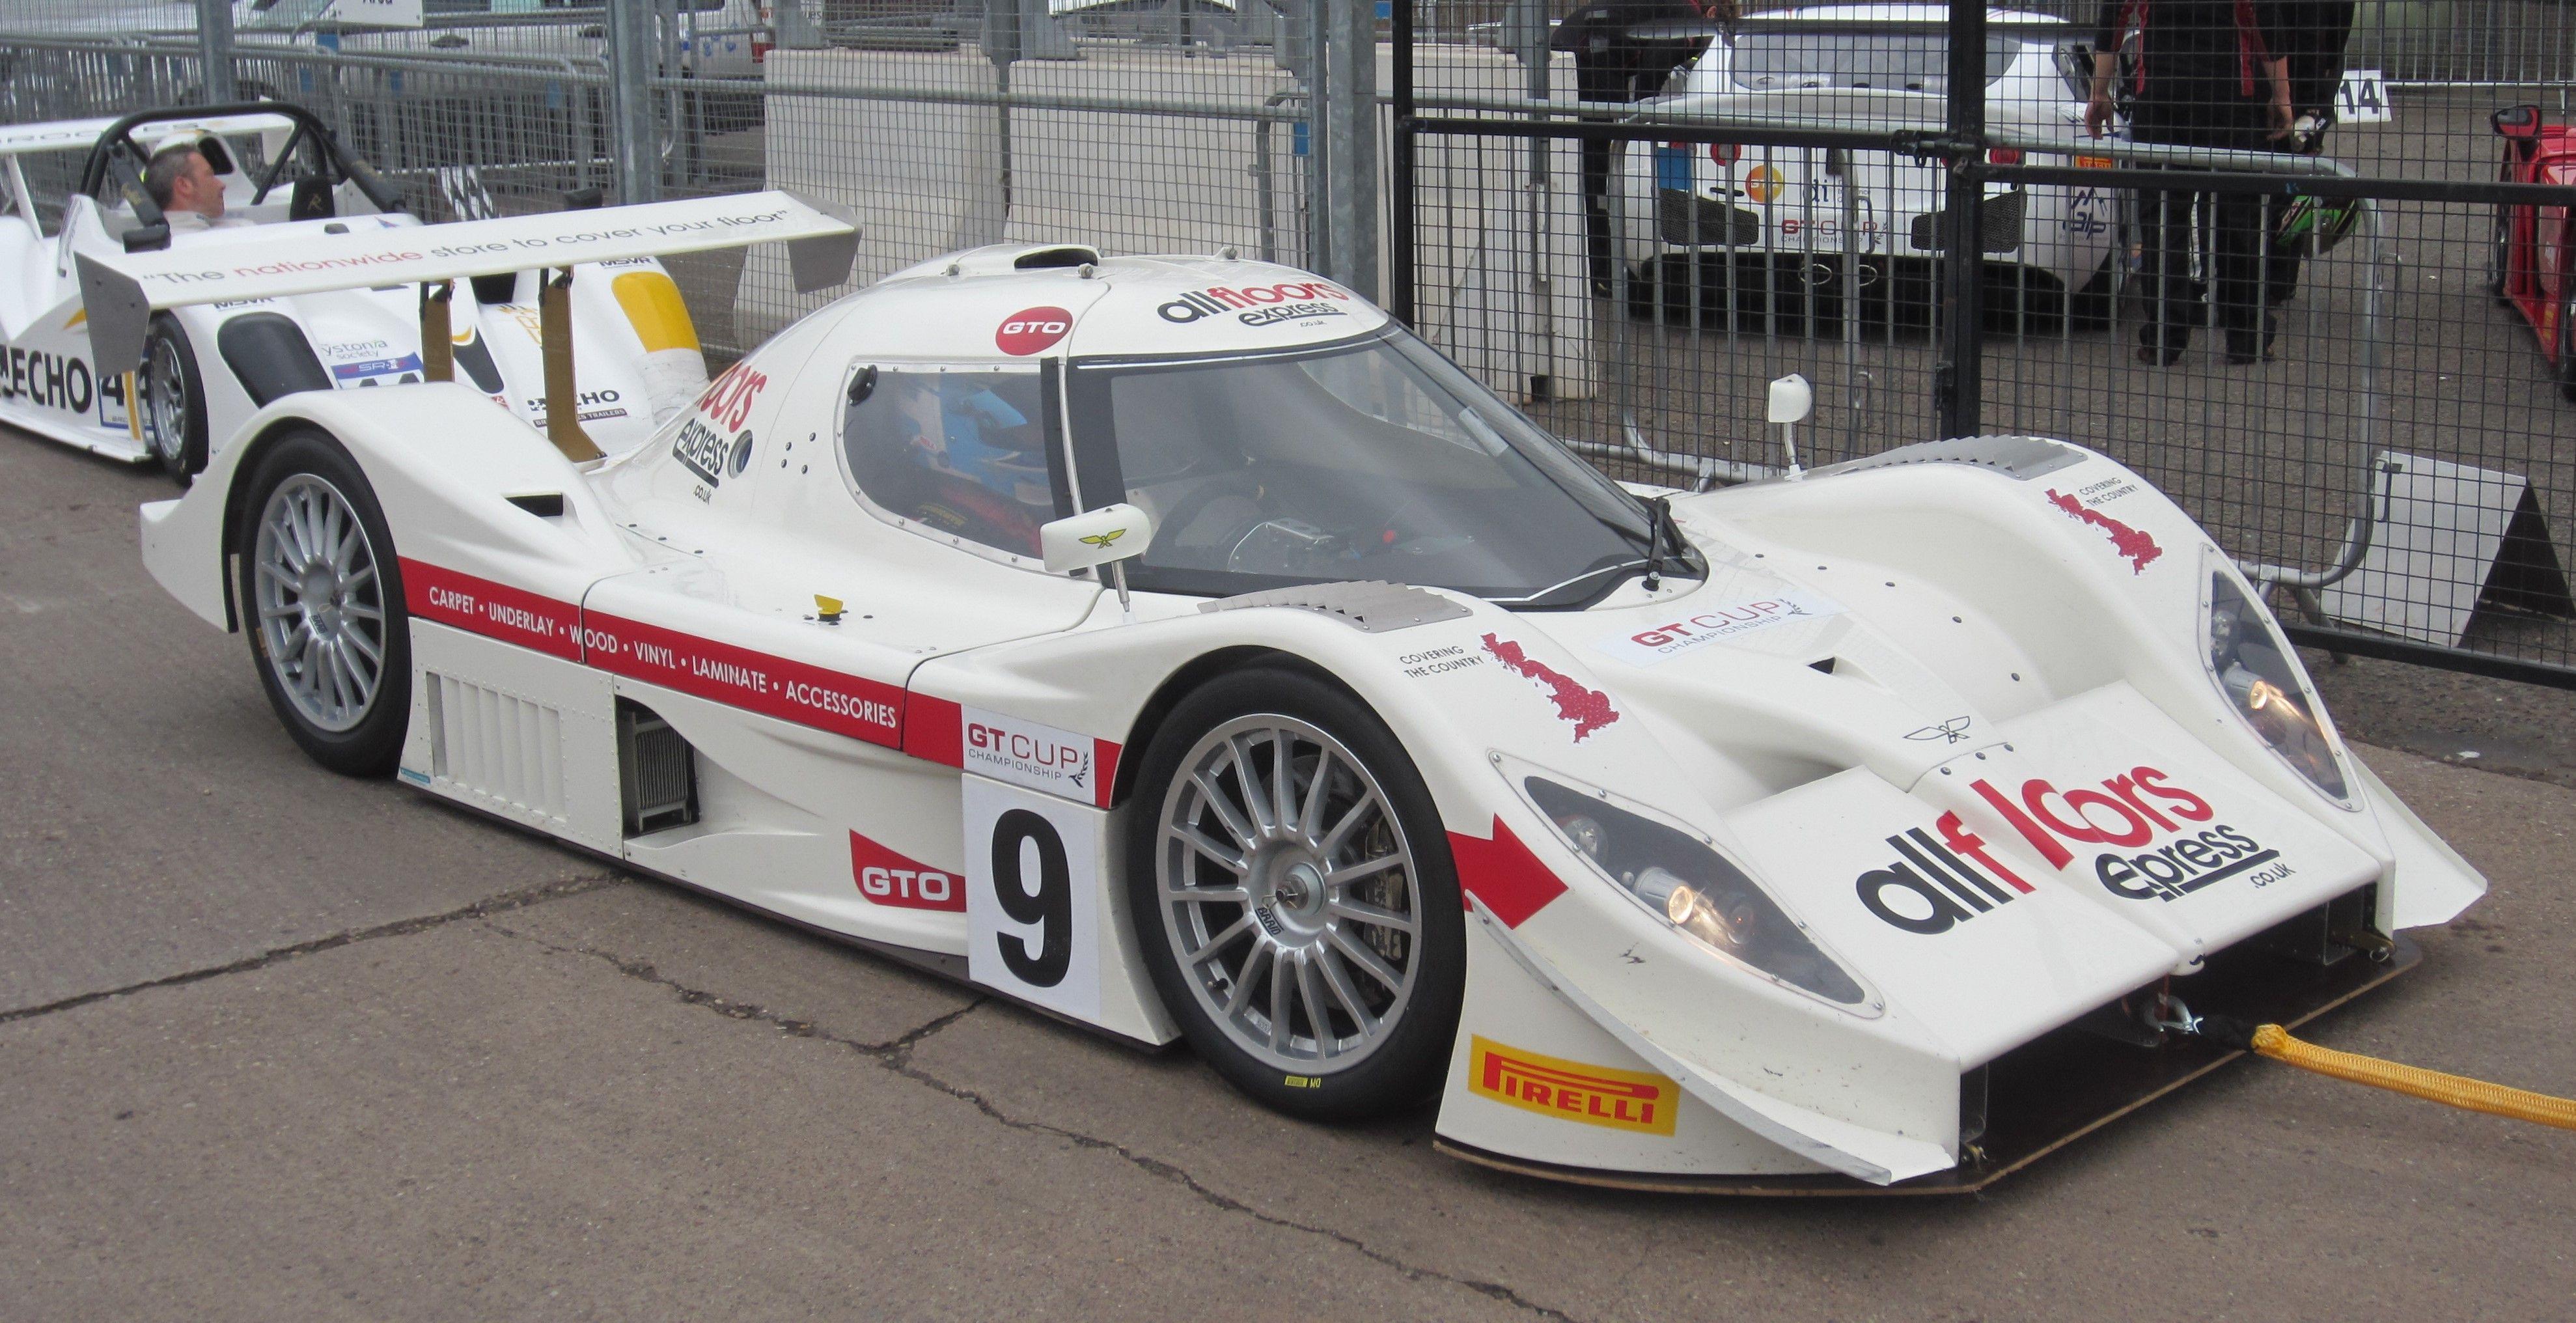 Aquilla Cr1 M60 Gto Gto Sports Car Race Cars